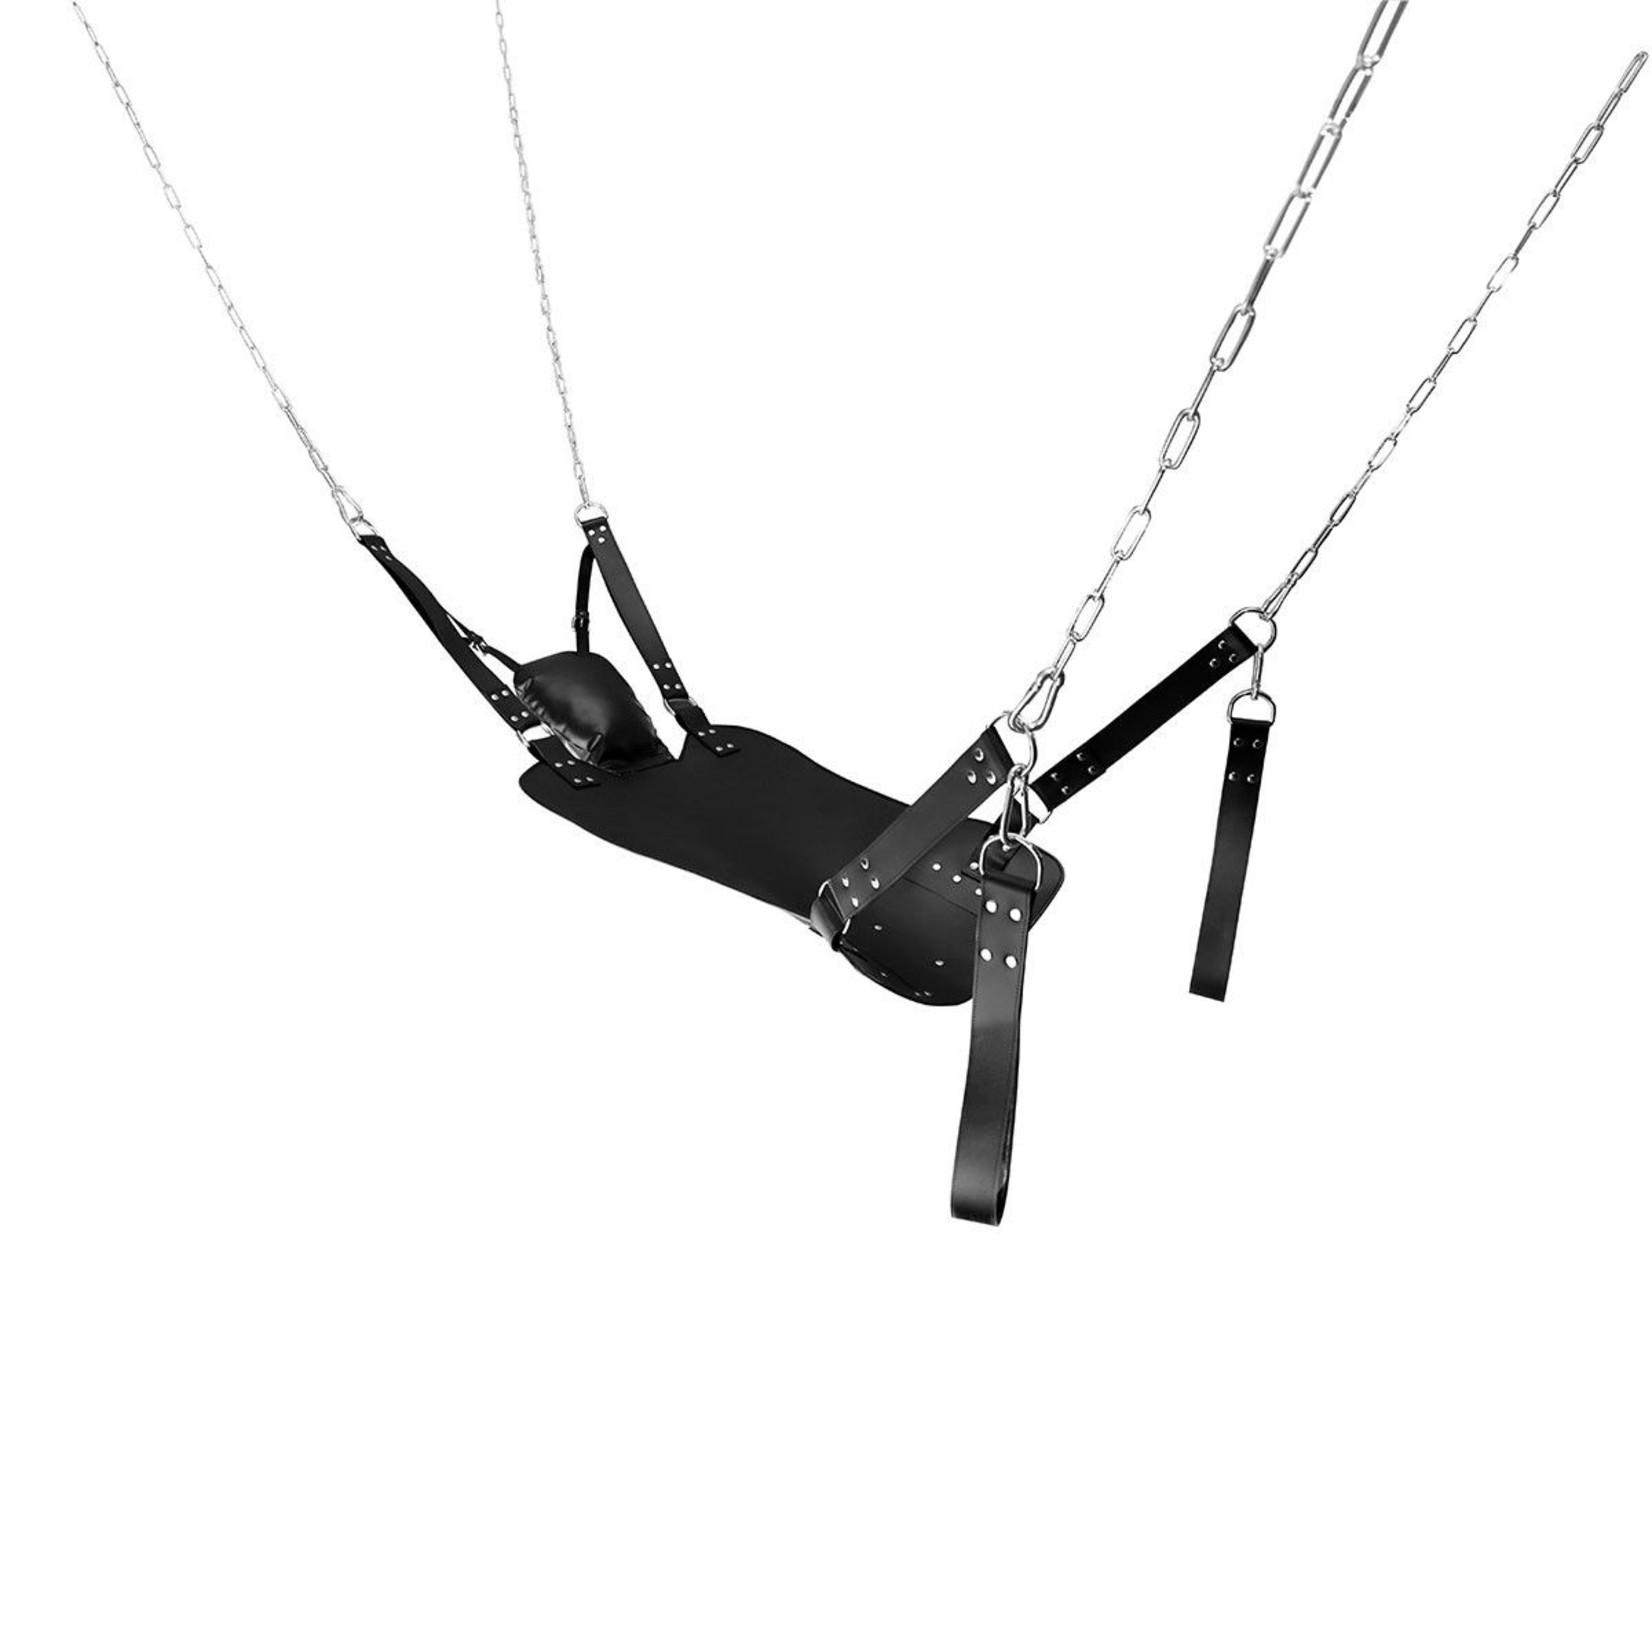 KIOTOS Sex Swing - Extreme Sling Deluxe